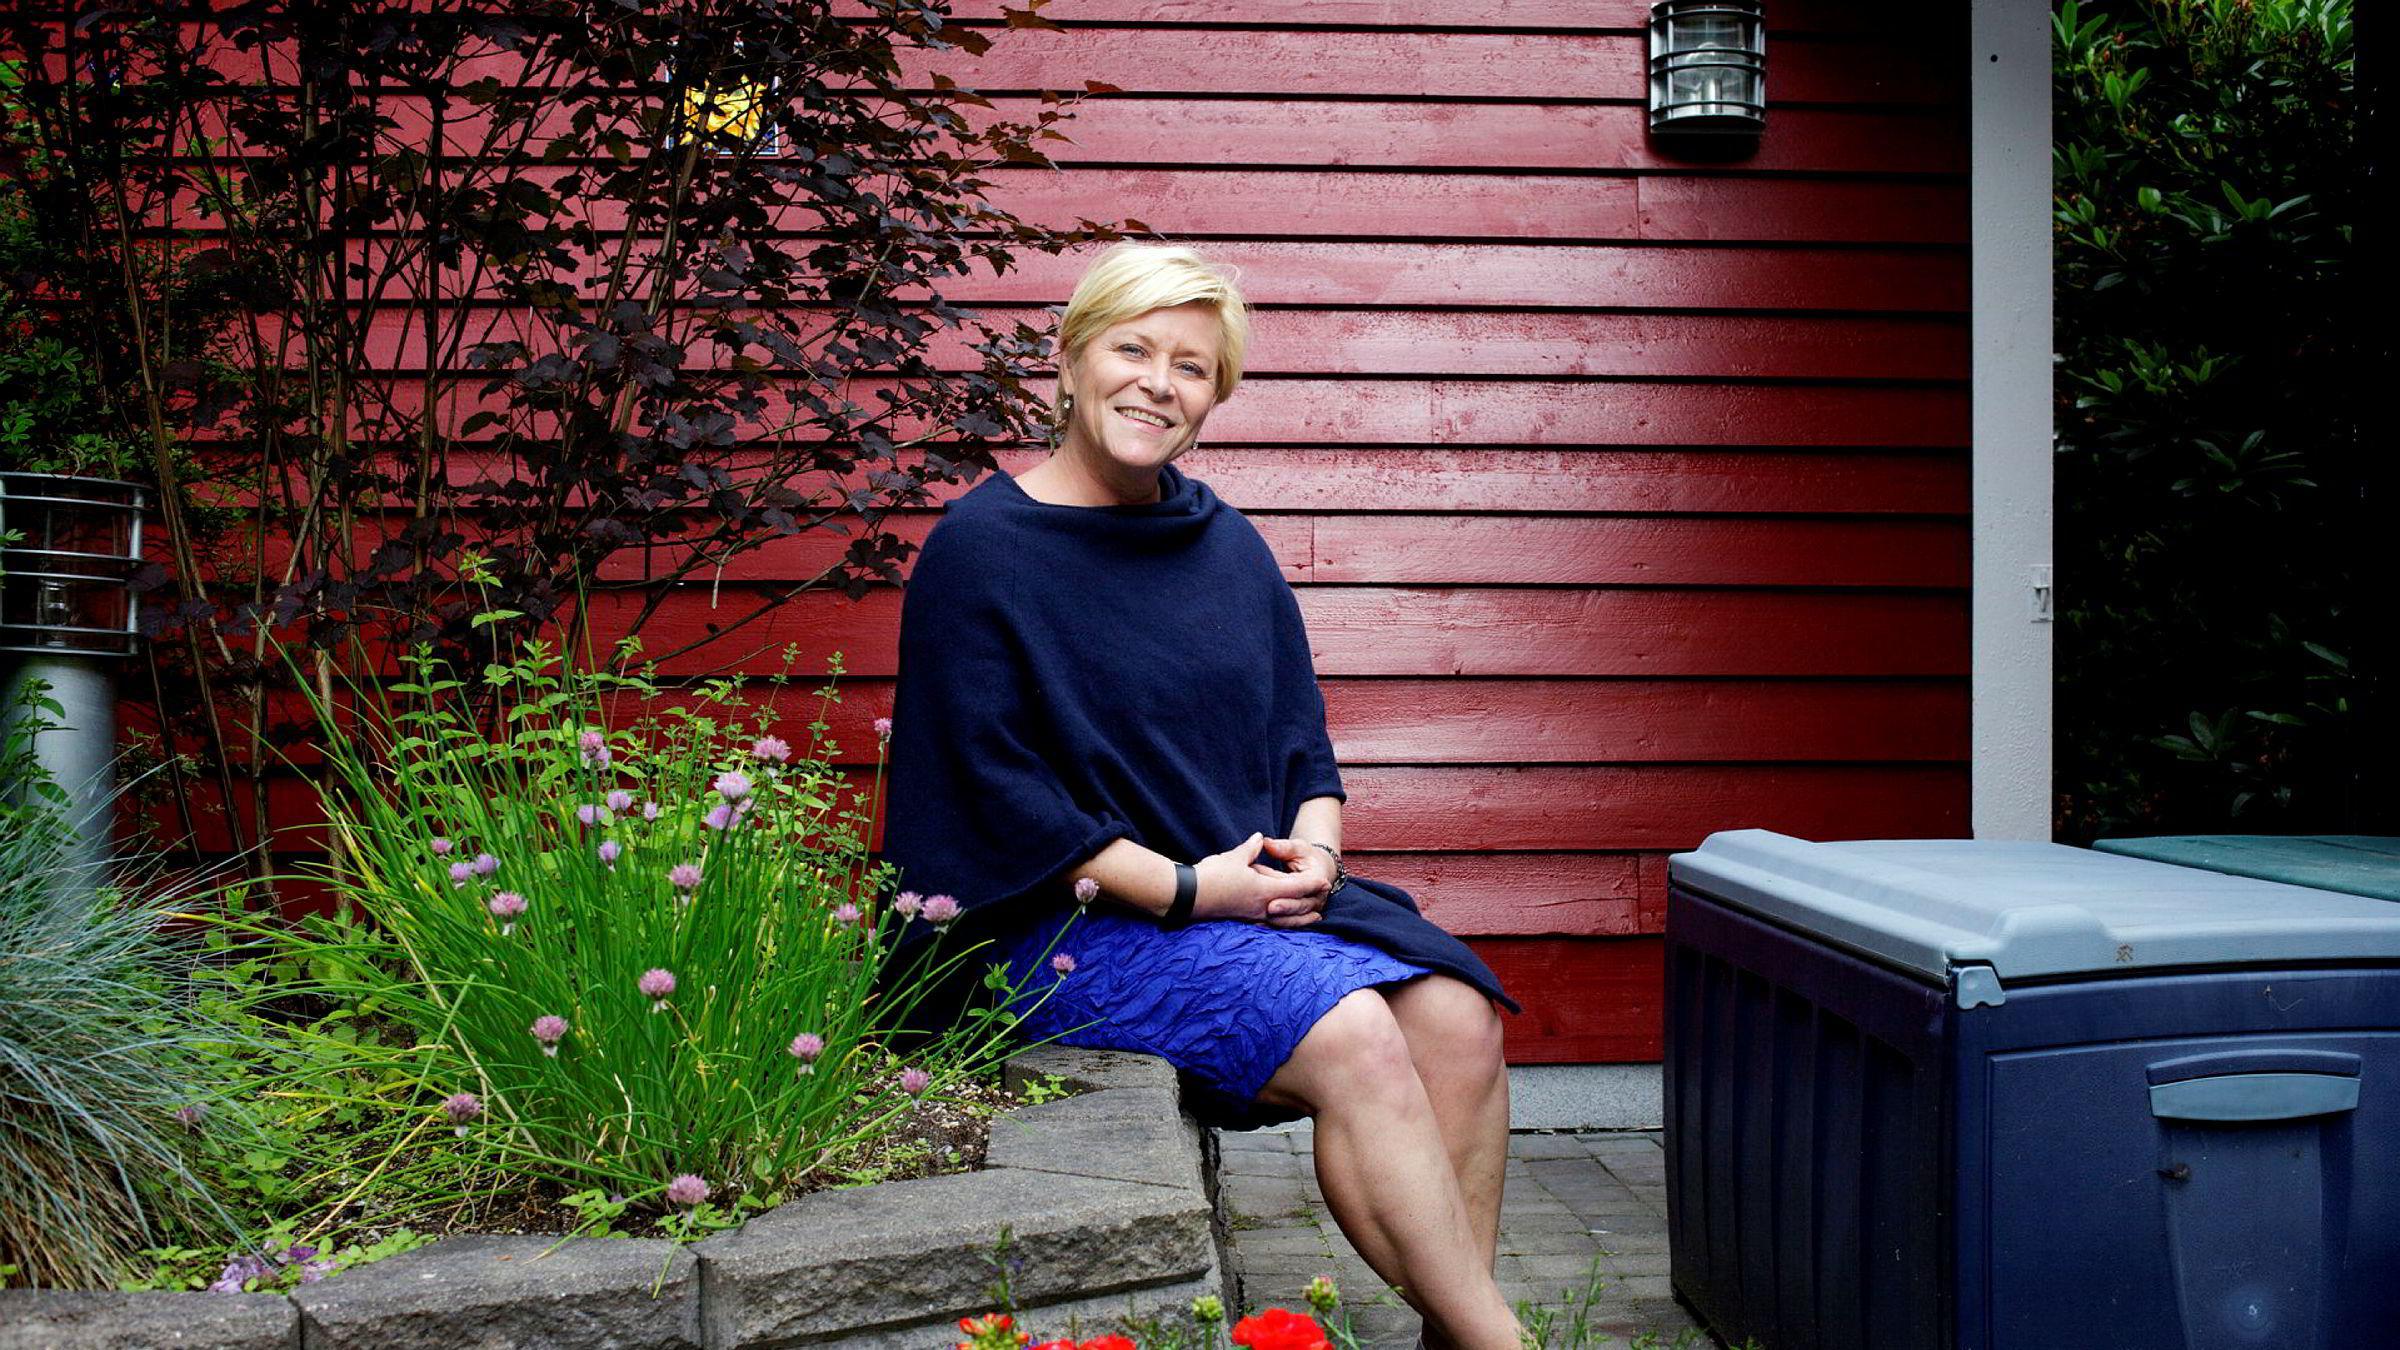 Selv i dag husker Siv Jensen da hun solgte sin første sko.